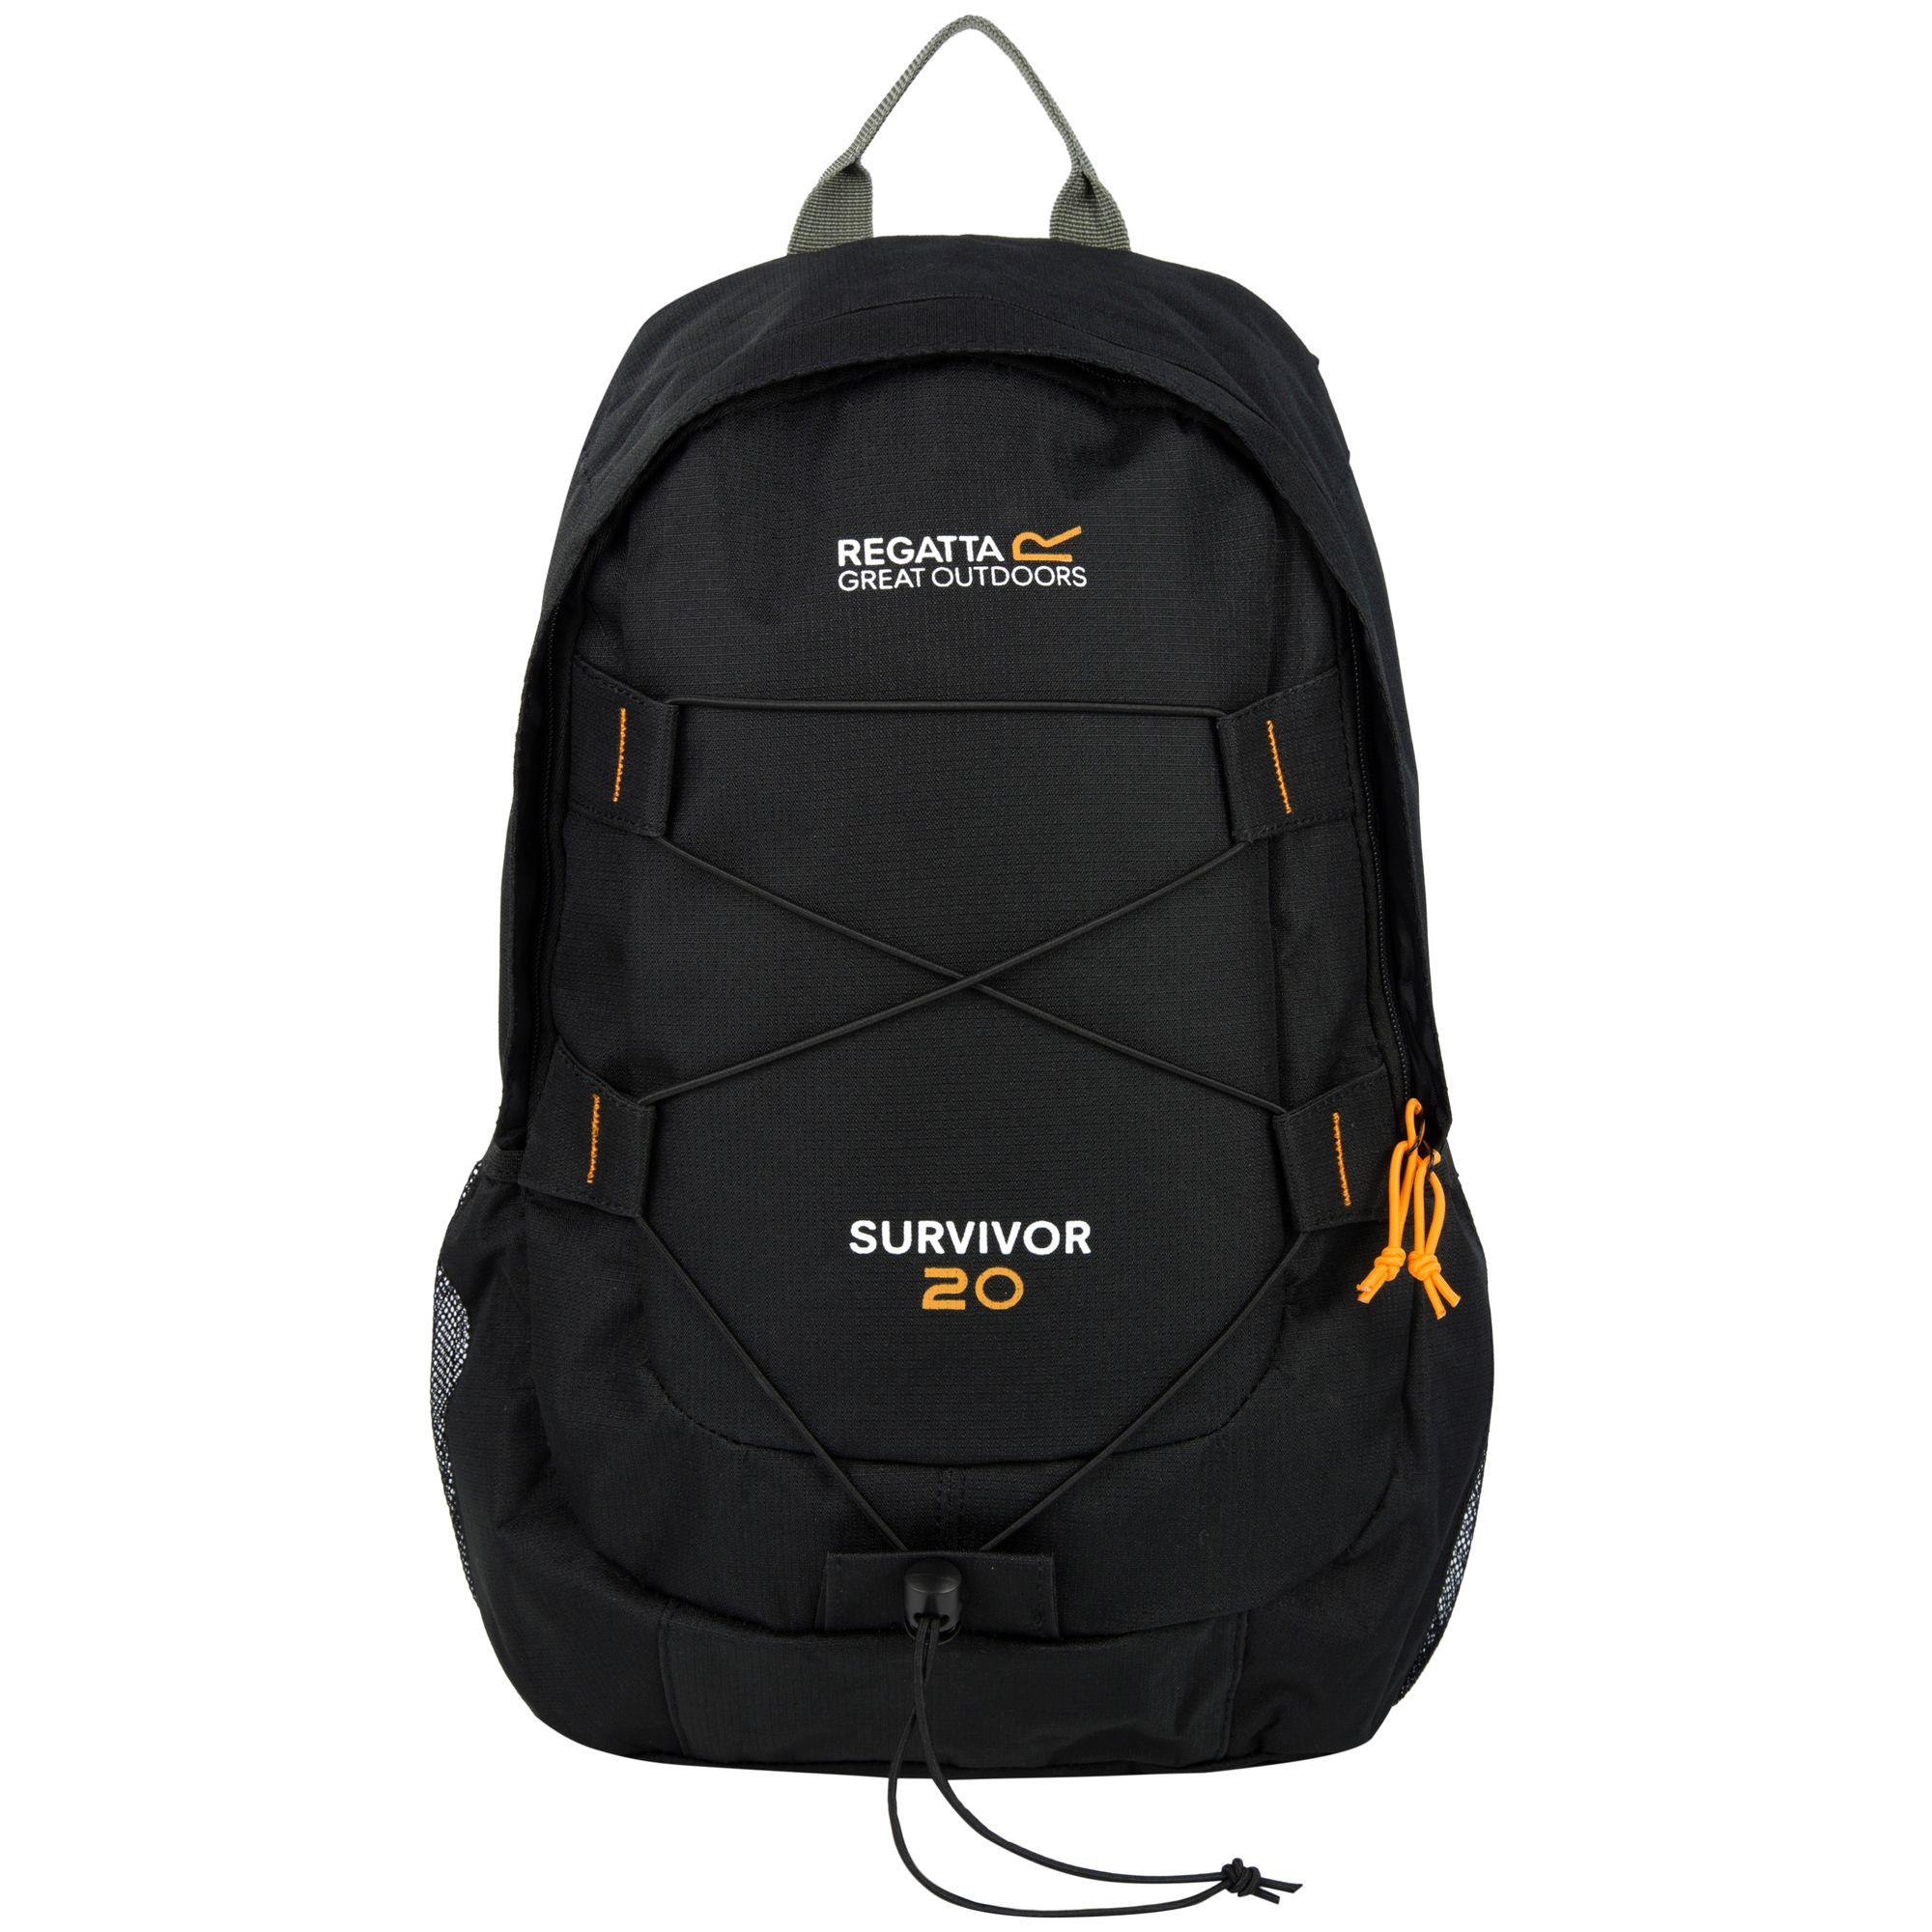 RG475 Regatta Great Outdoors Kids Zephyr Backpack//Daypack